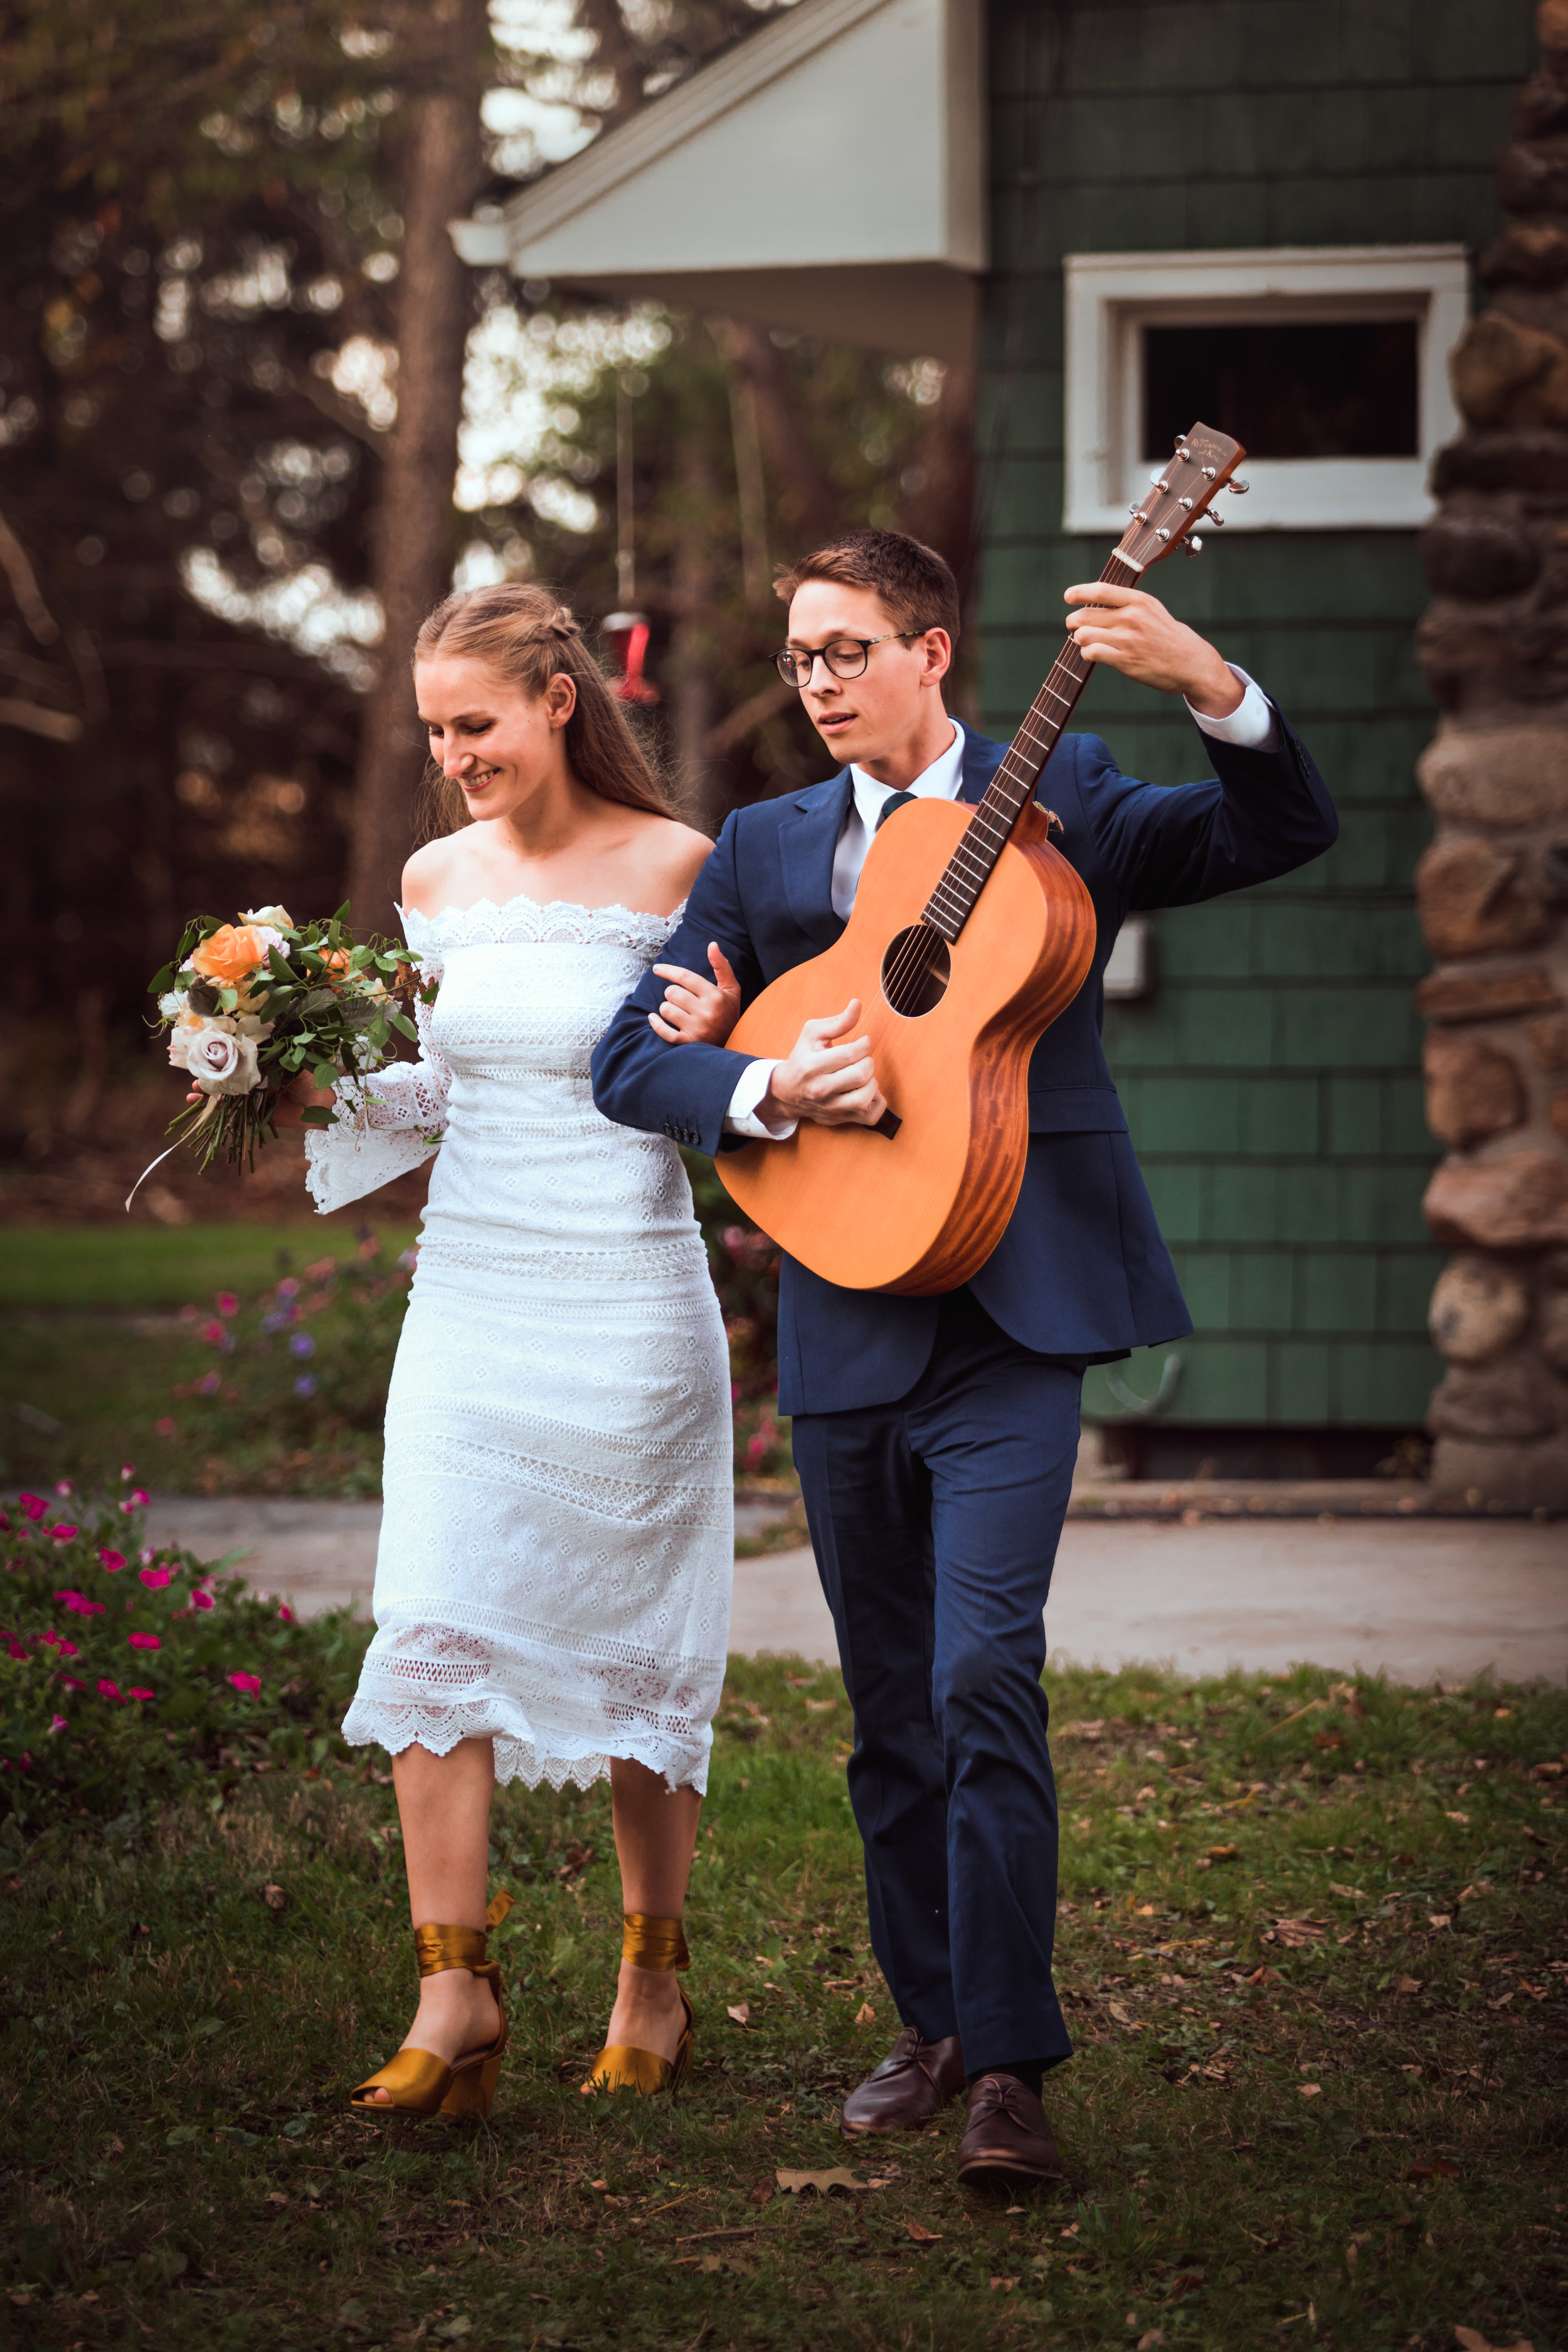 vild-photography-photographer-tahoe-intimate-wedding-adventure-van-abigail-17.jpg